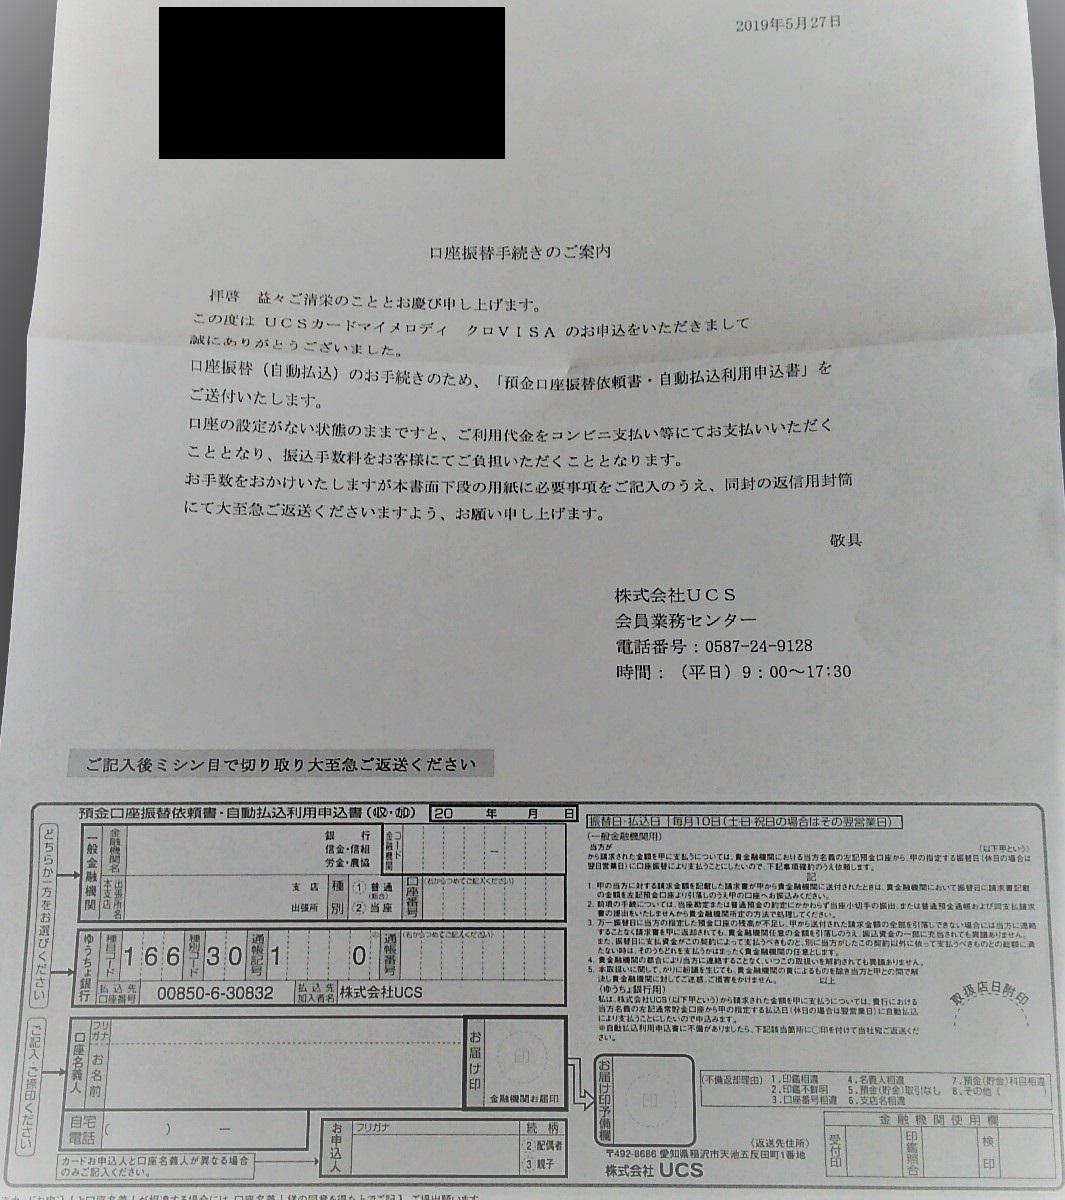 f:id:yotsumao:20190607222507j:plain